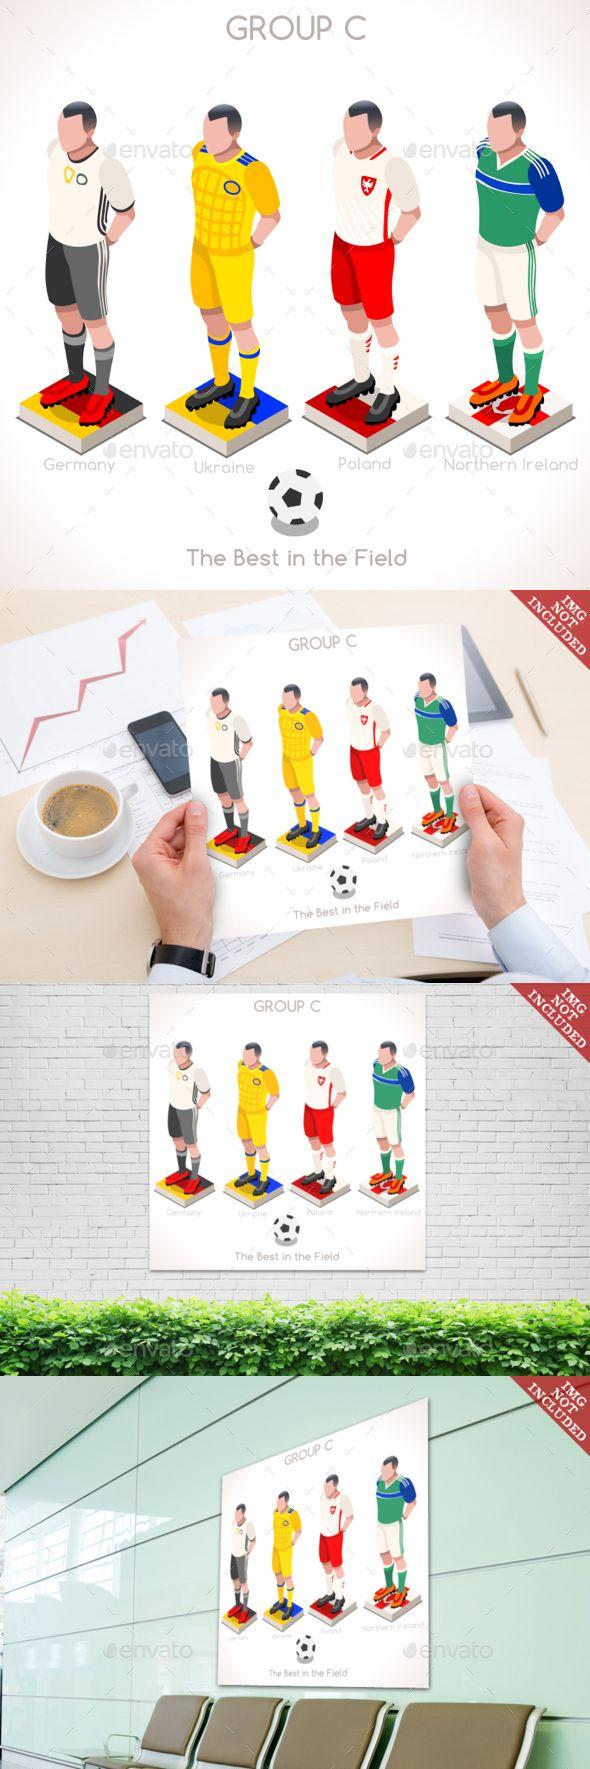 Euro 2016 Championship Group C